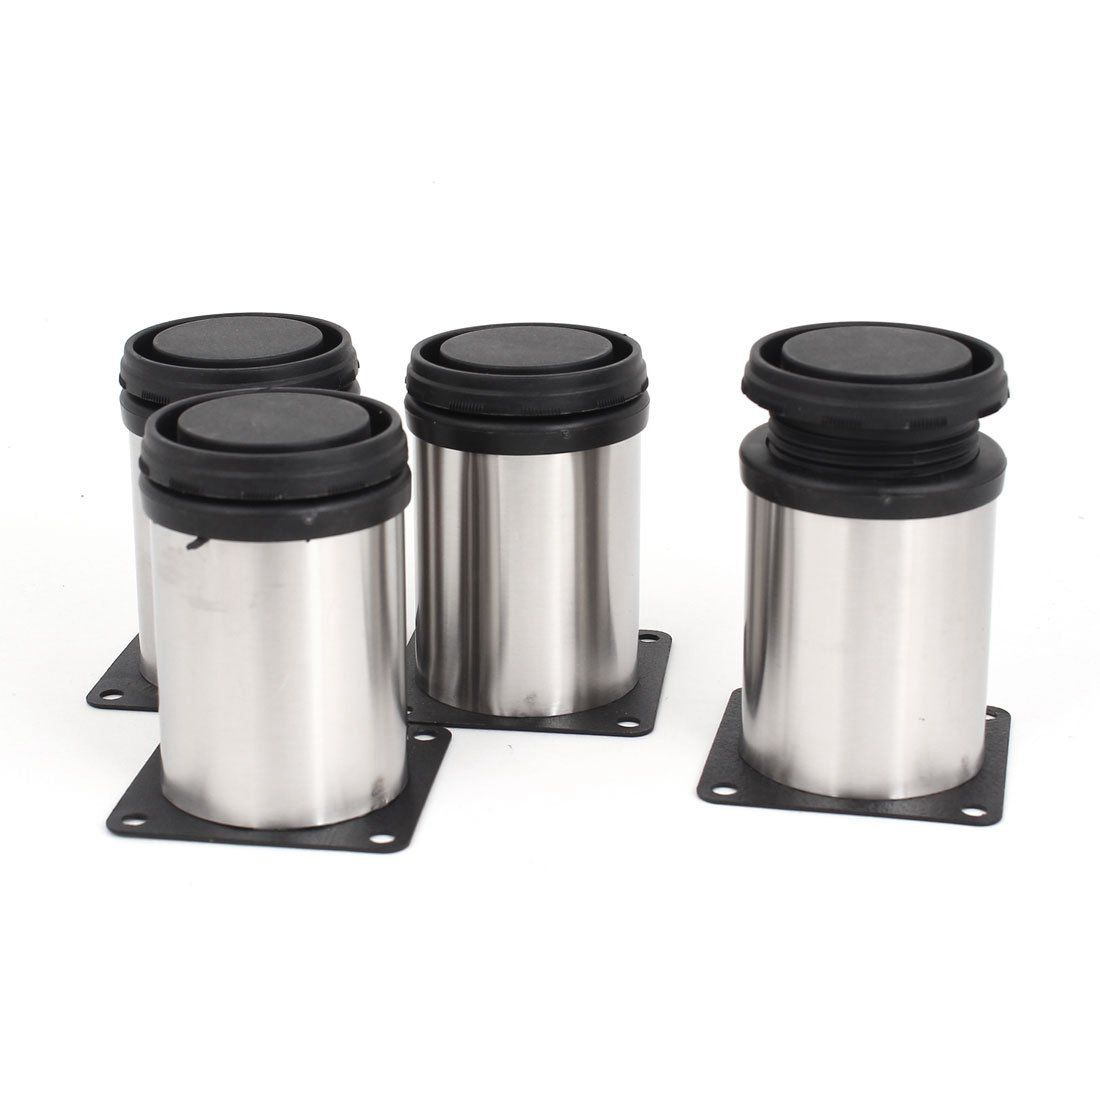 gewicht 358 g hauptfarbe silber ton schwarz zylinder groesse geschlossen 80 x 50 mm h d material edelstahl kunststoff produkt name verstellbar - Kuechenschraenke